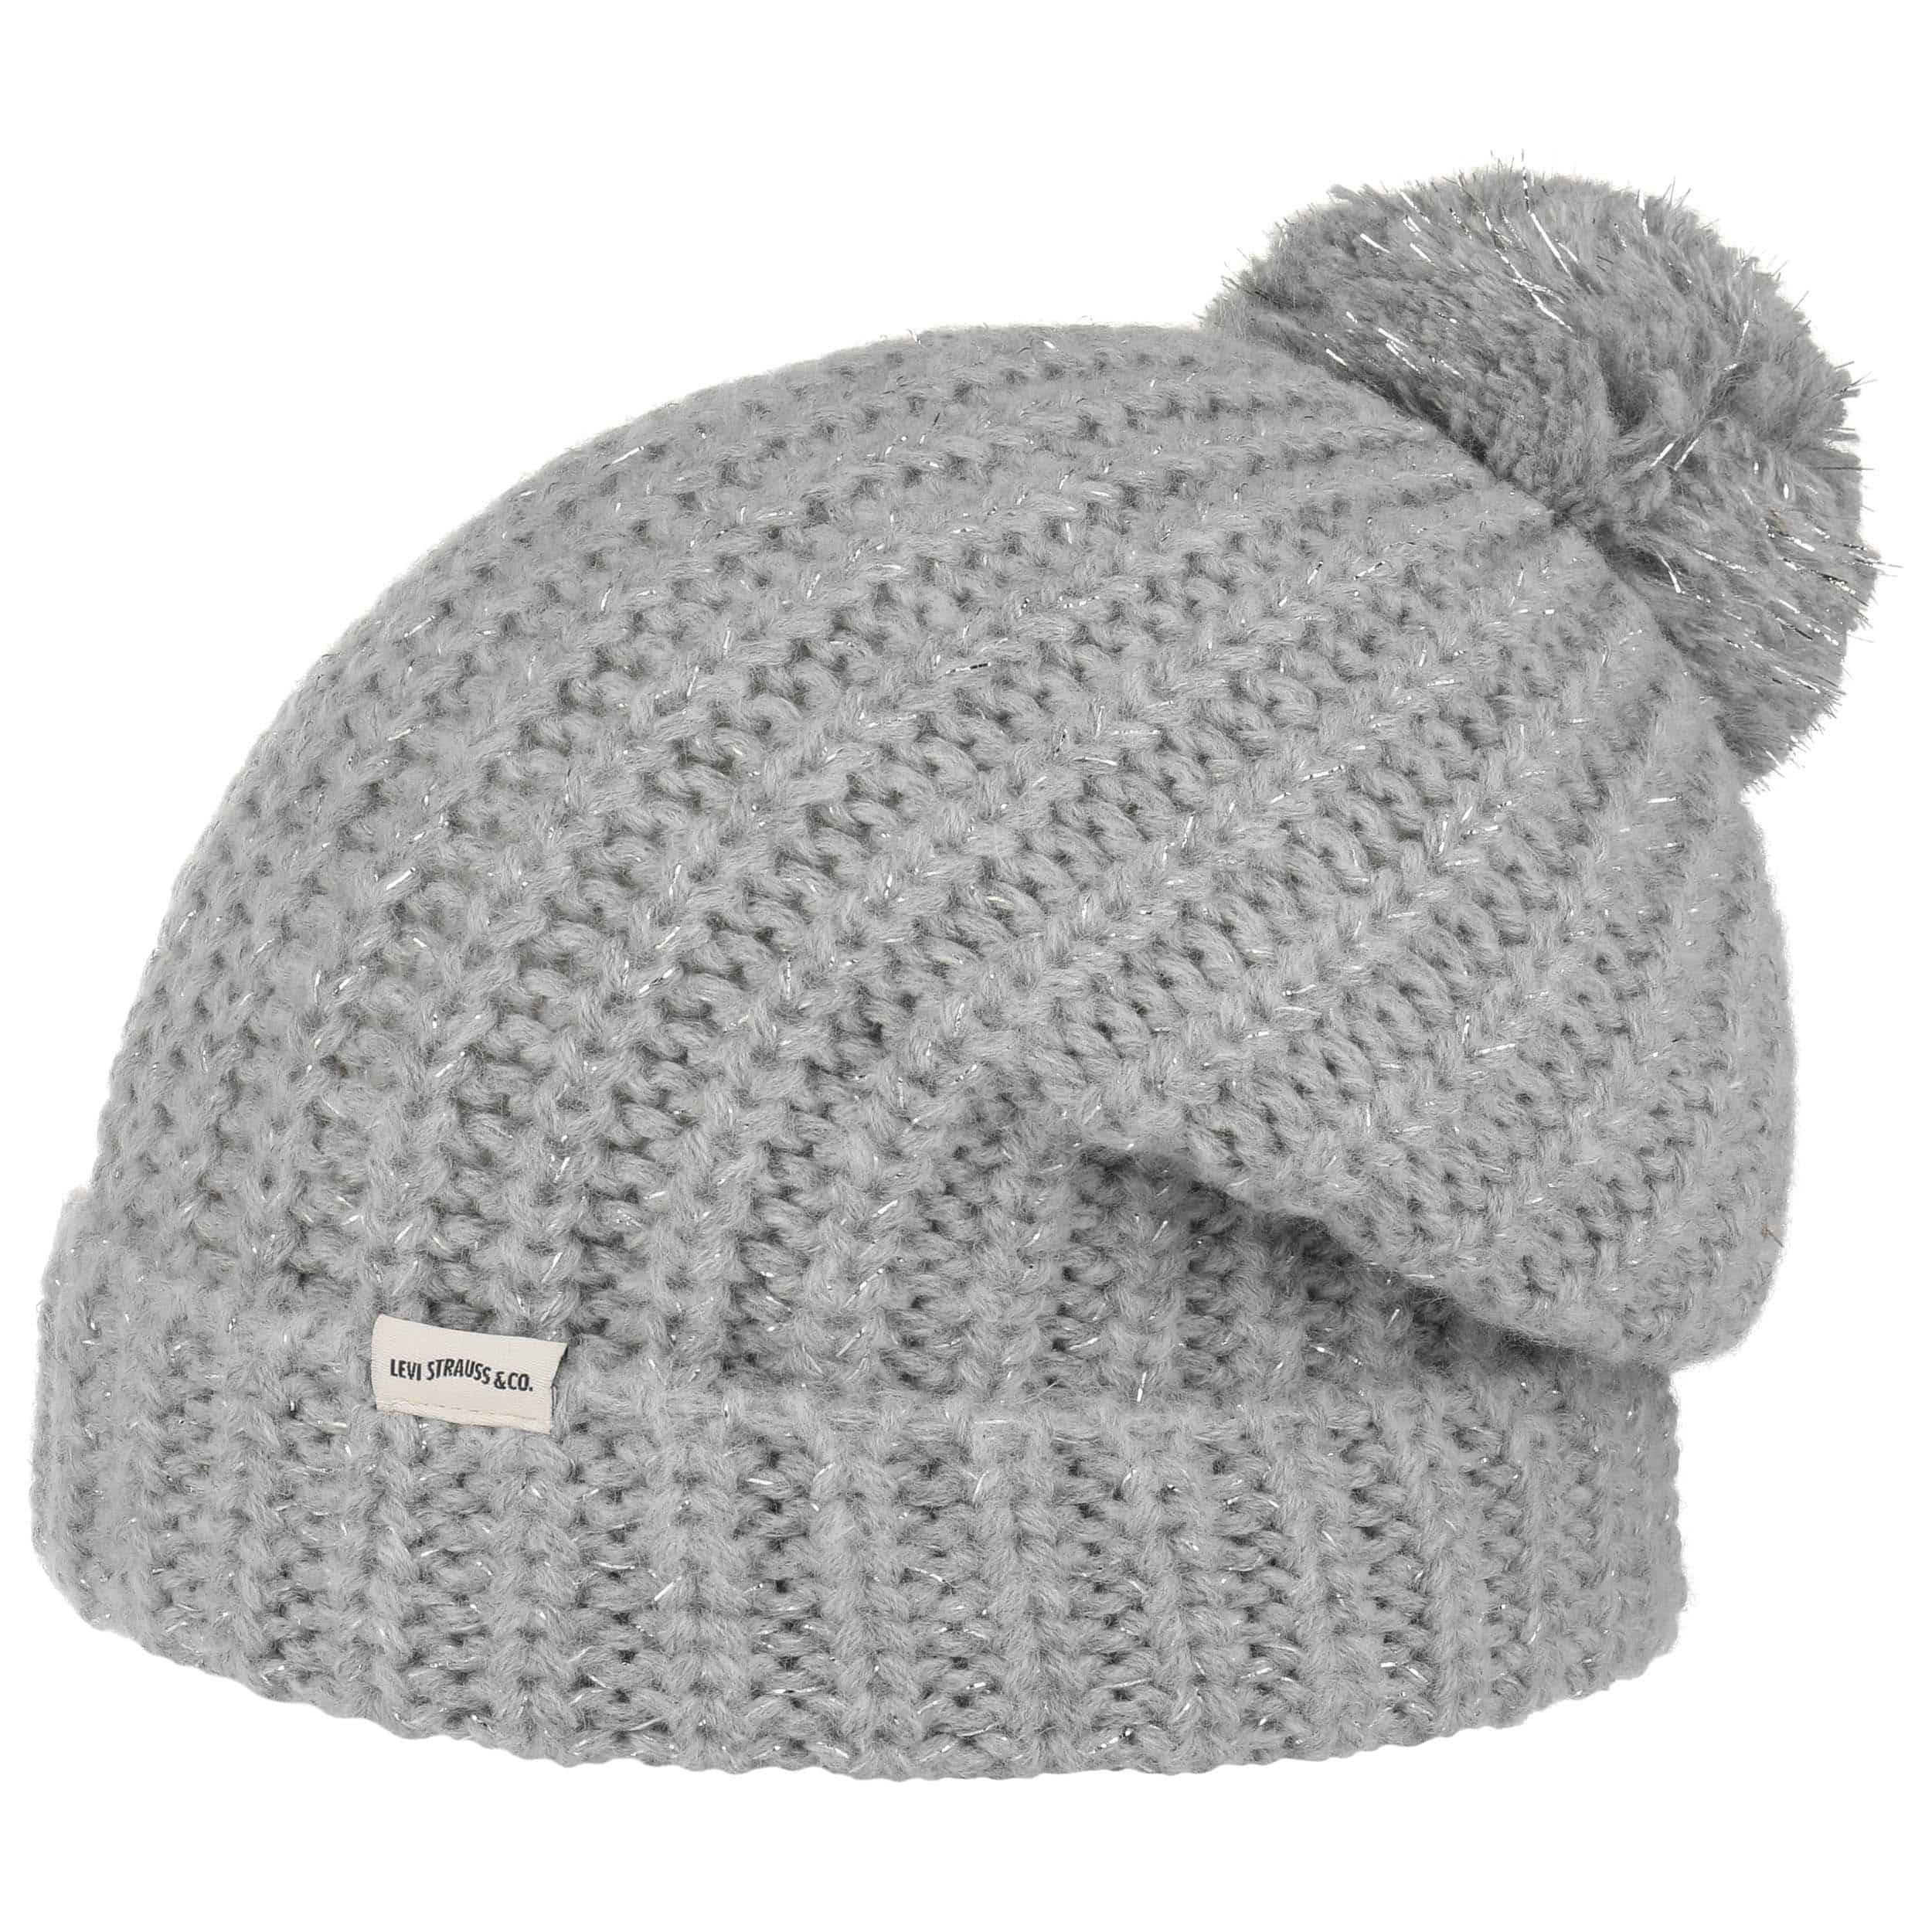 7c6b8f22310cb Gorro Beanie Lurex by Levi´s - Gorros - sombreroshop.es